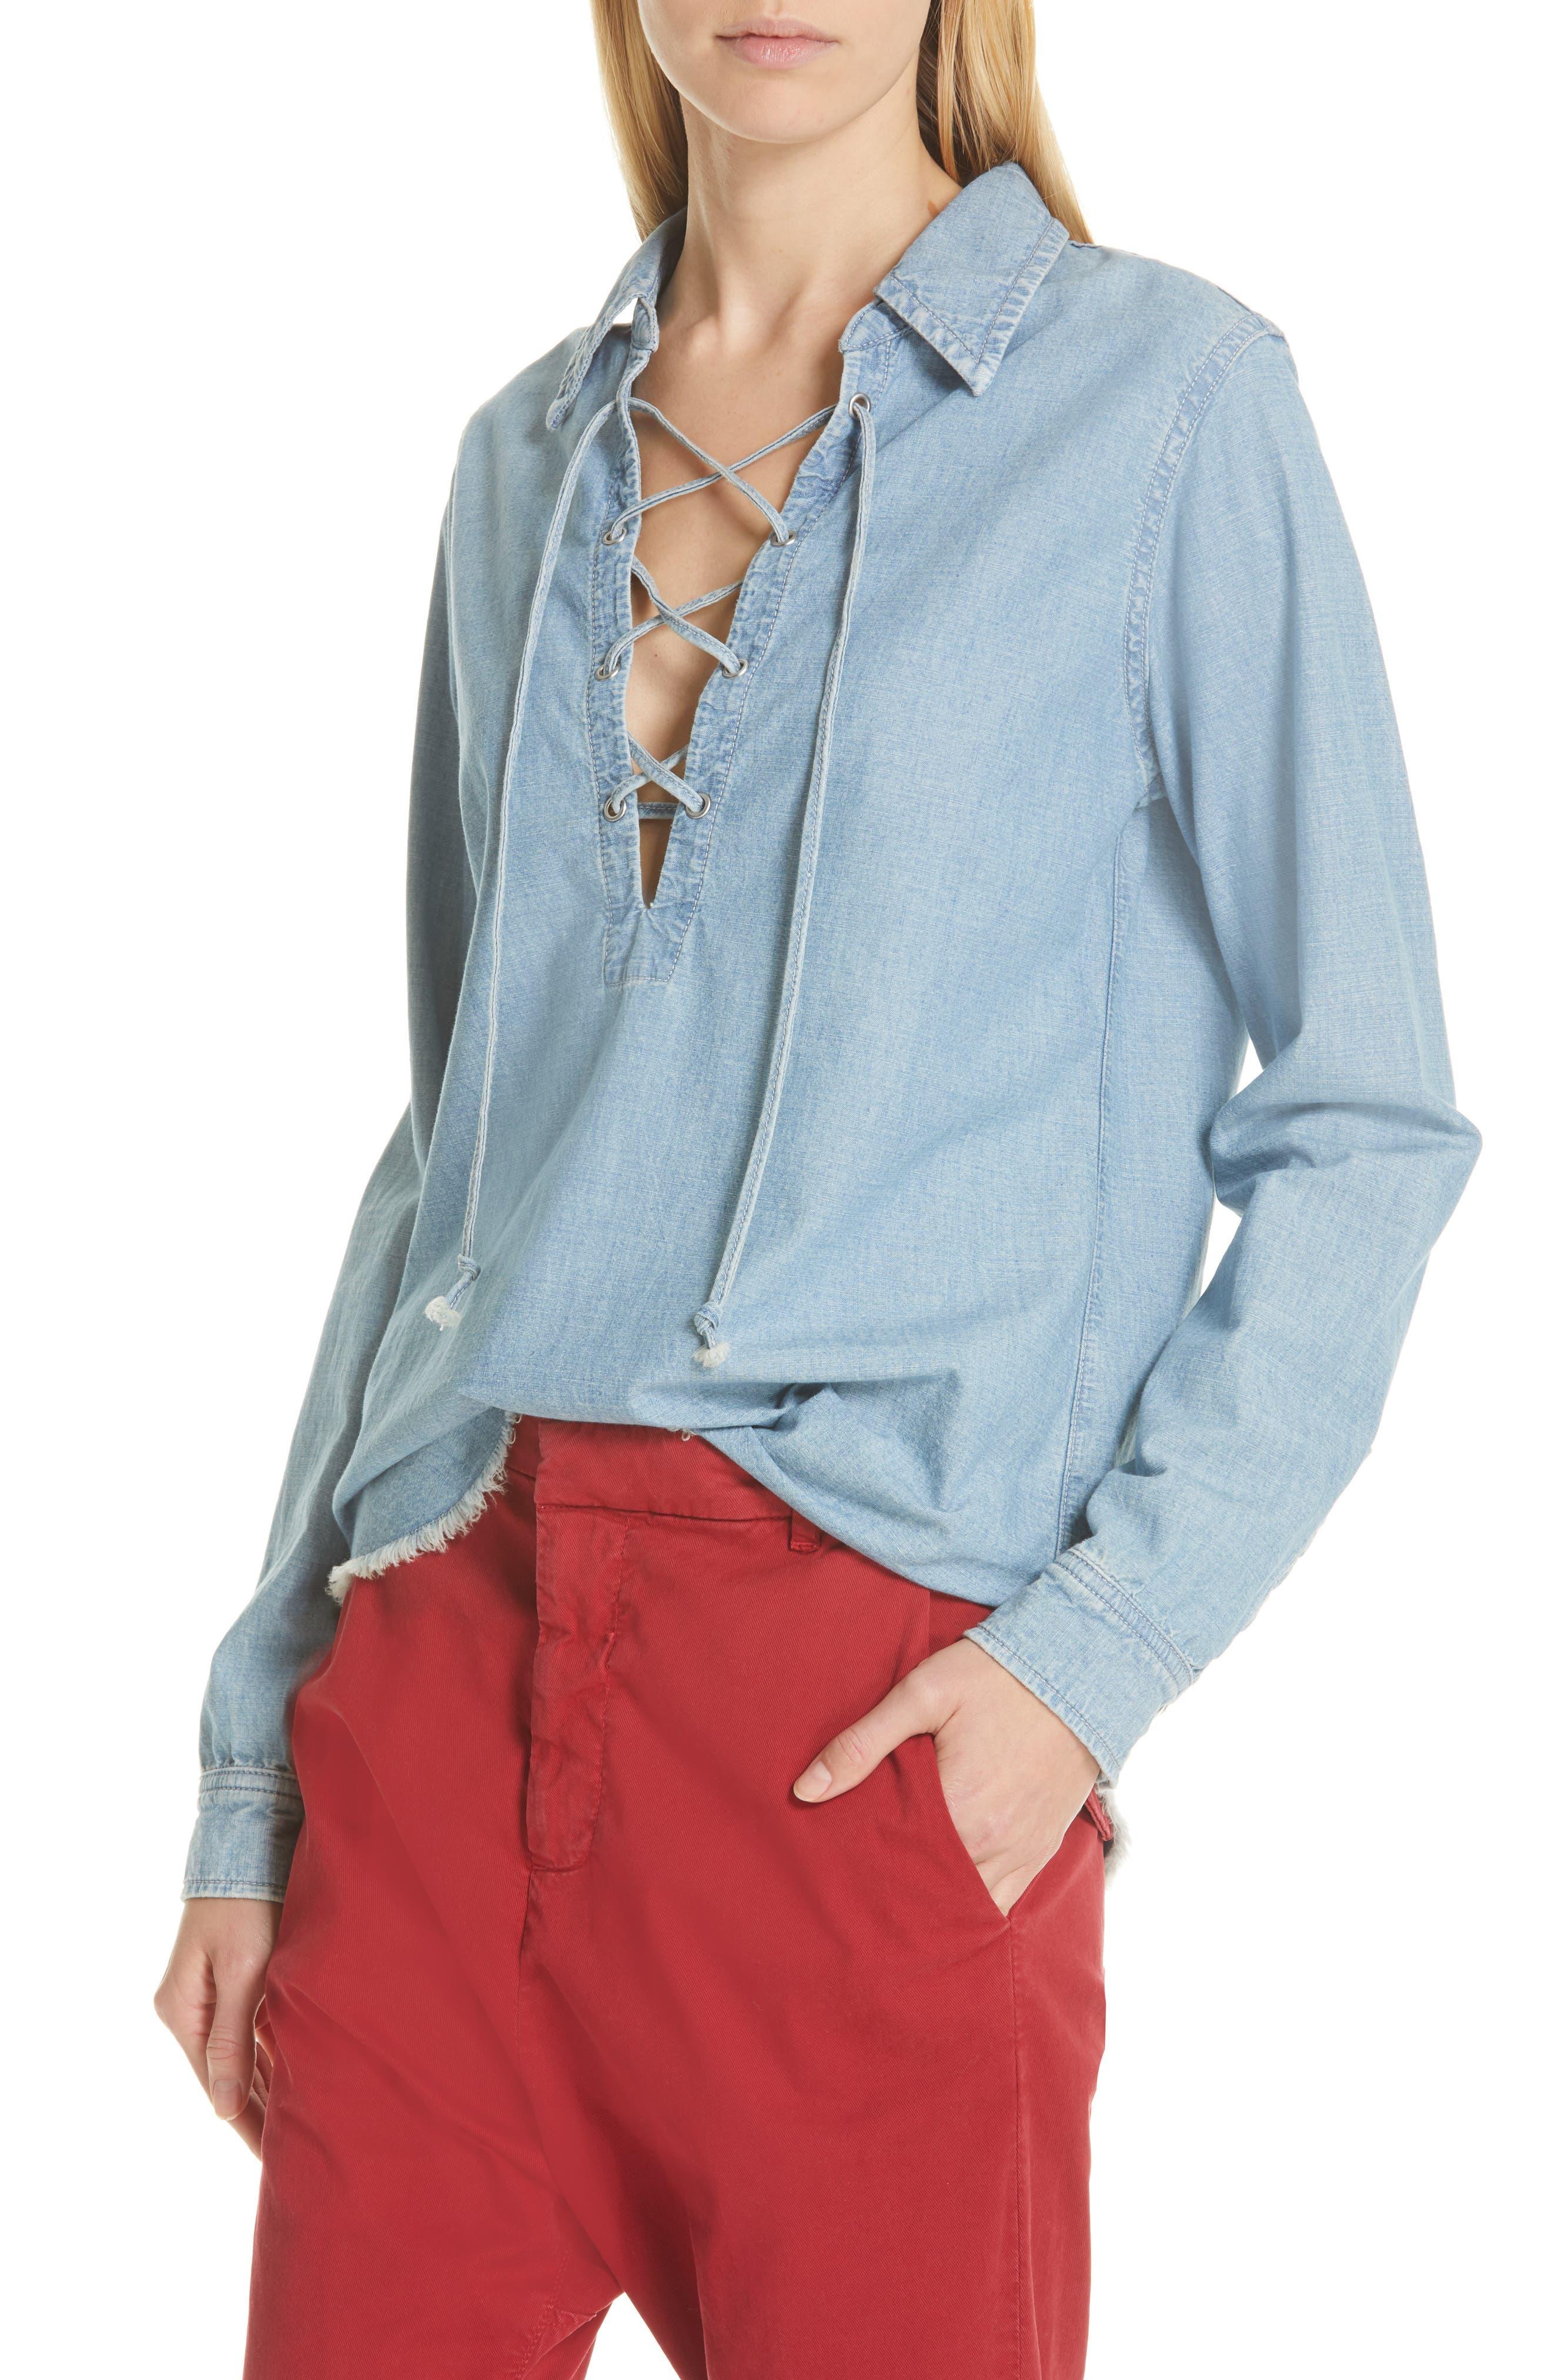 NILI LOTAN, Mallory Chambray Shirt, Alternate thumbnail 4, color, SKY BLUE